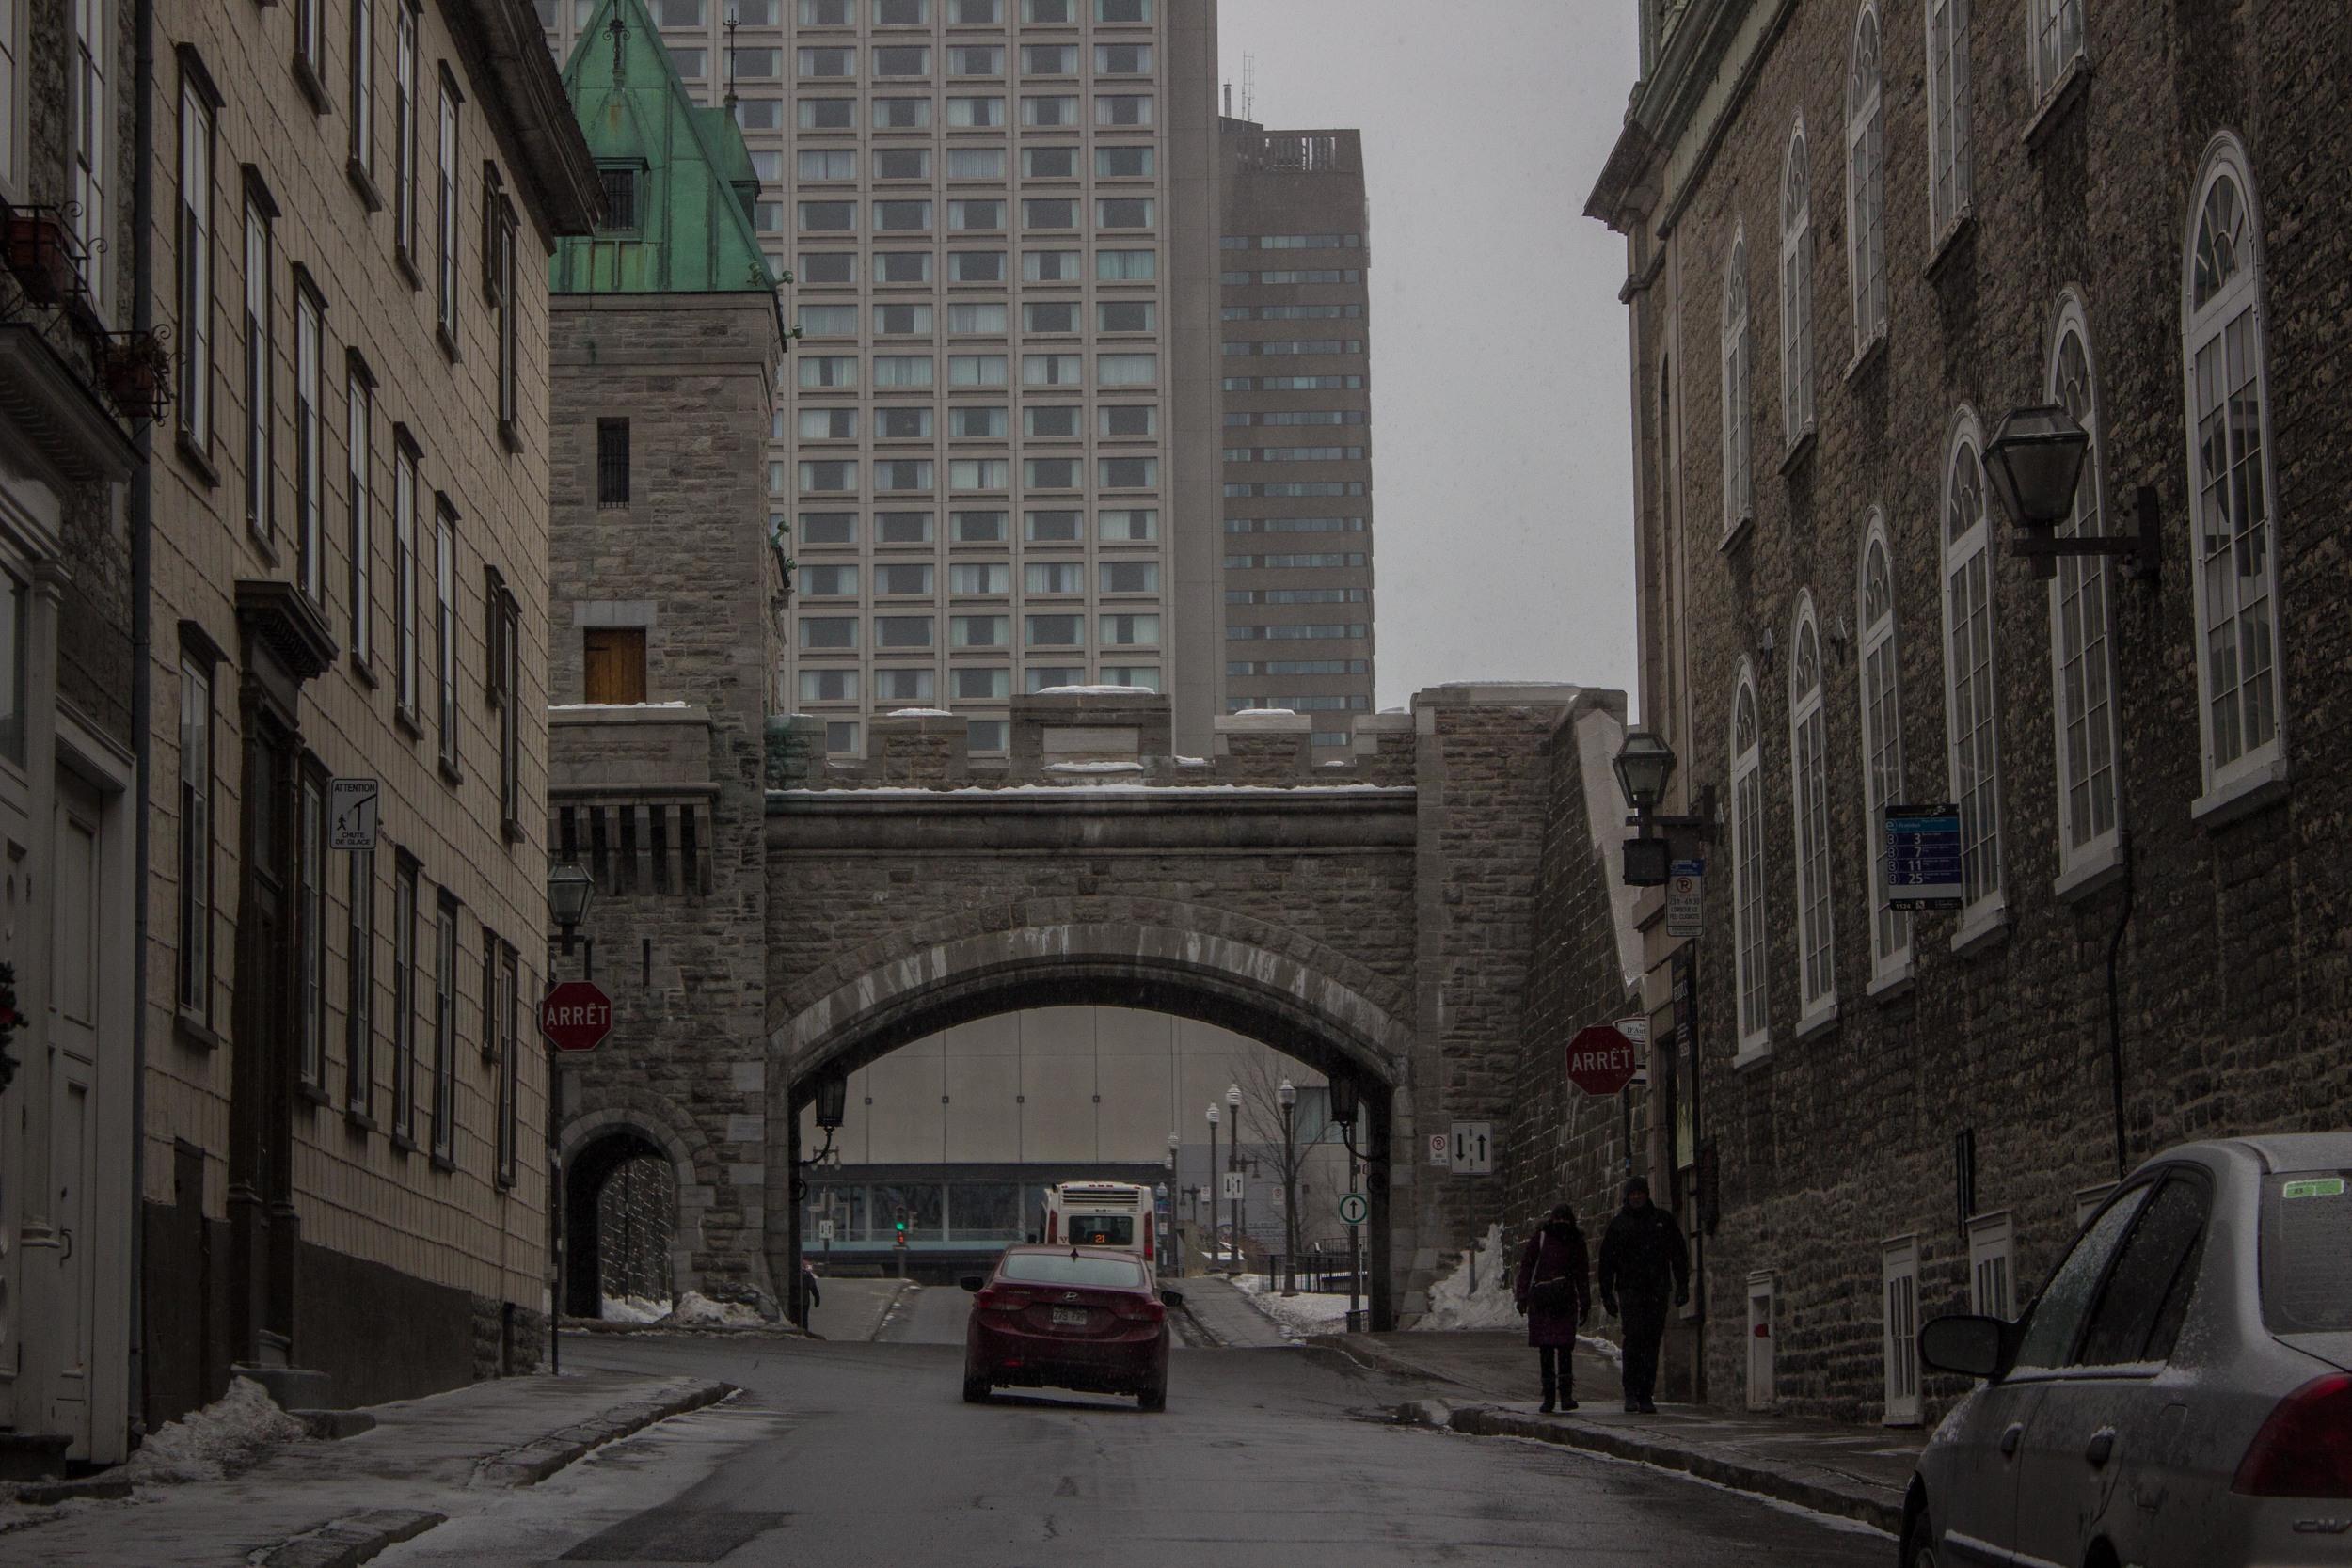 Quebec_140315_0057.jpg